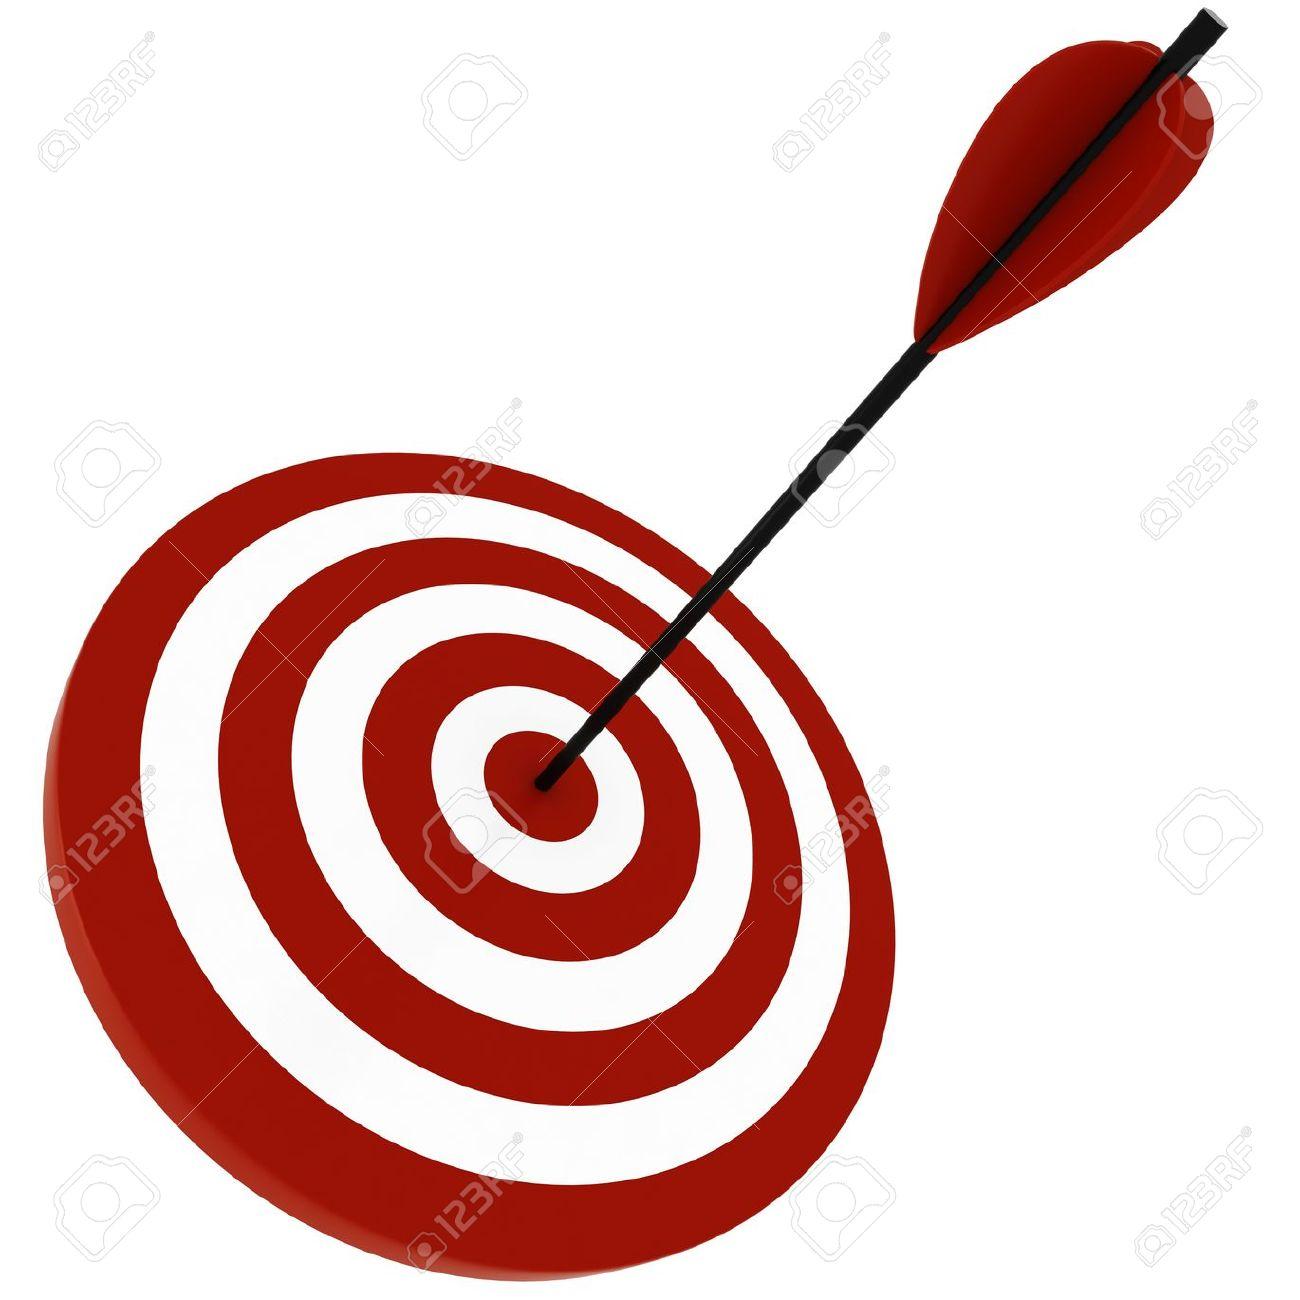 Shooting arrow target clipart jpg royalty free stock Shooting arrow target clipart - ClipartFest jpg royalty free stock